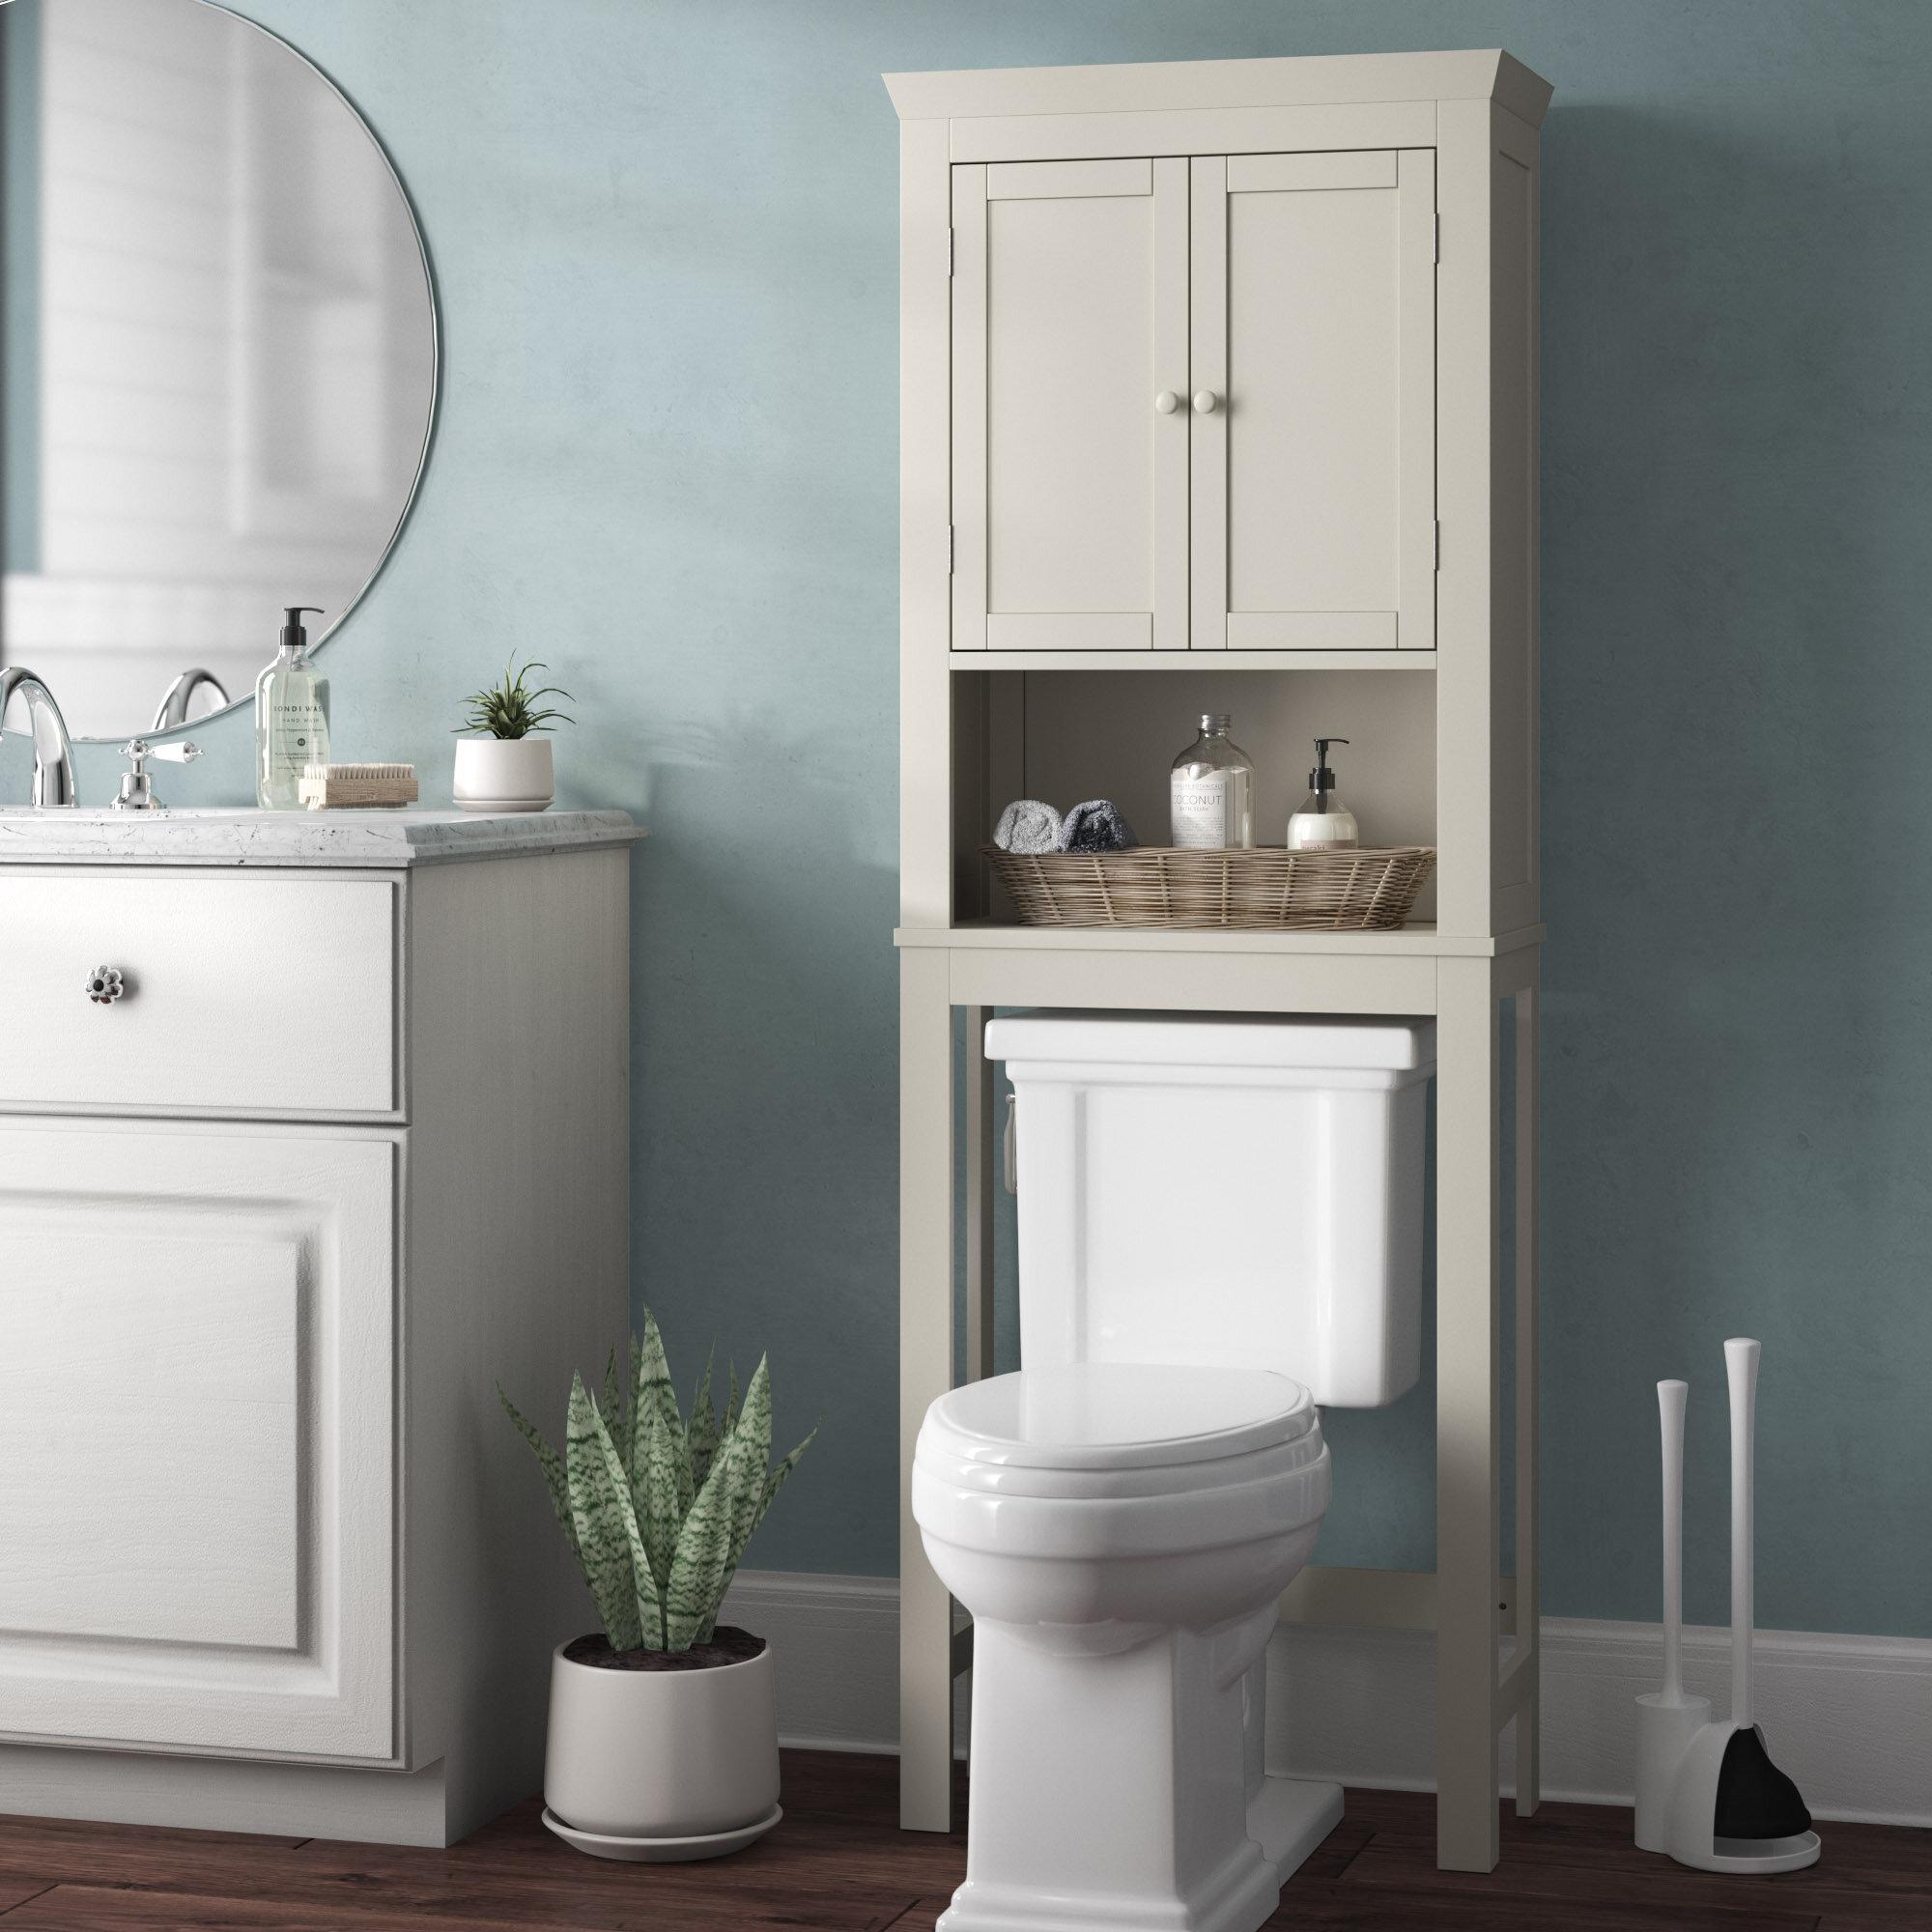 Three Posts Chorley Bathroom Space Saver 23 6 W X 66 75 H Over